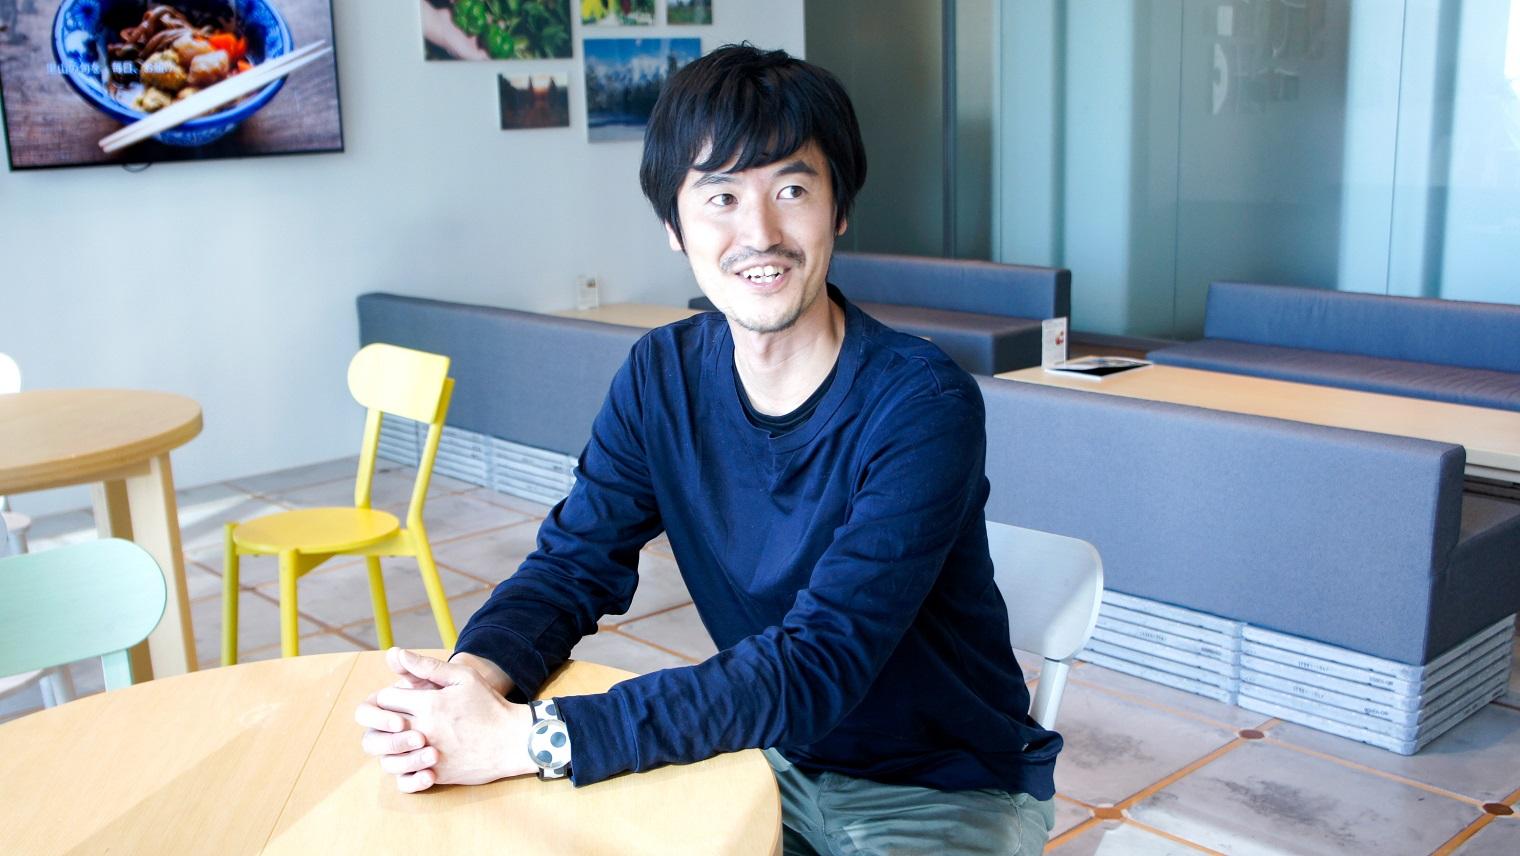 伊藤陽一 ソニー株式会社 Startup Acceleration部